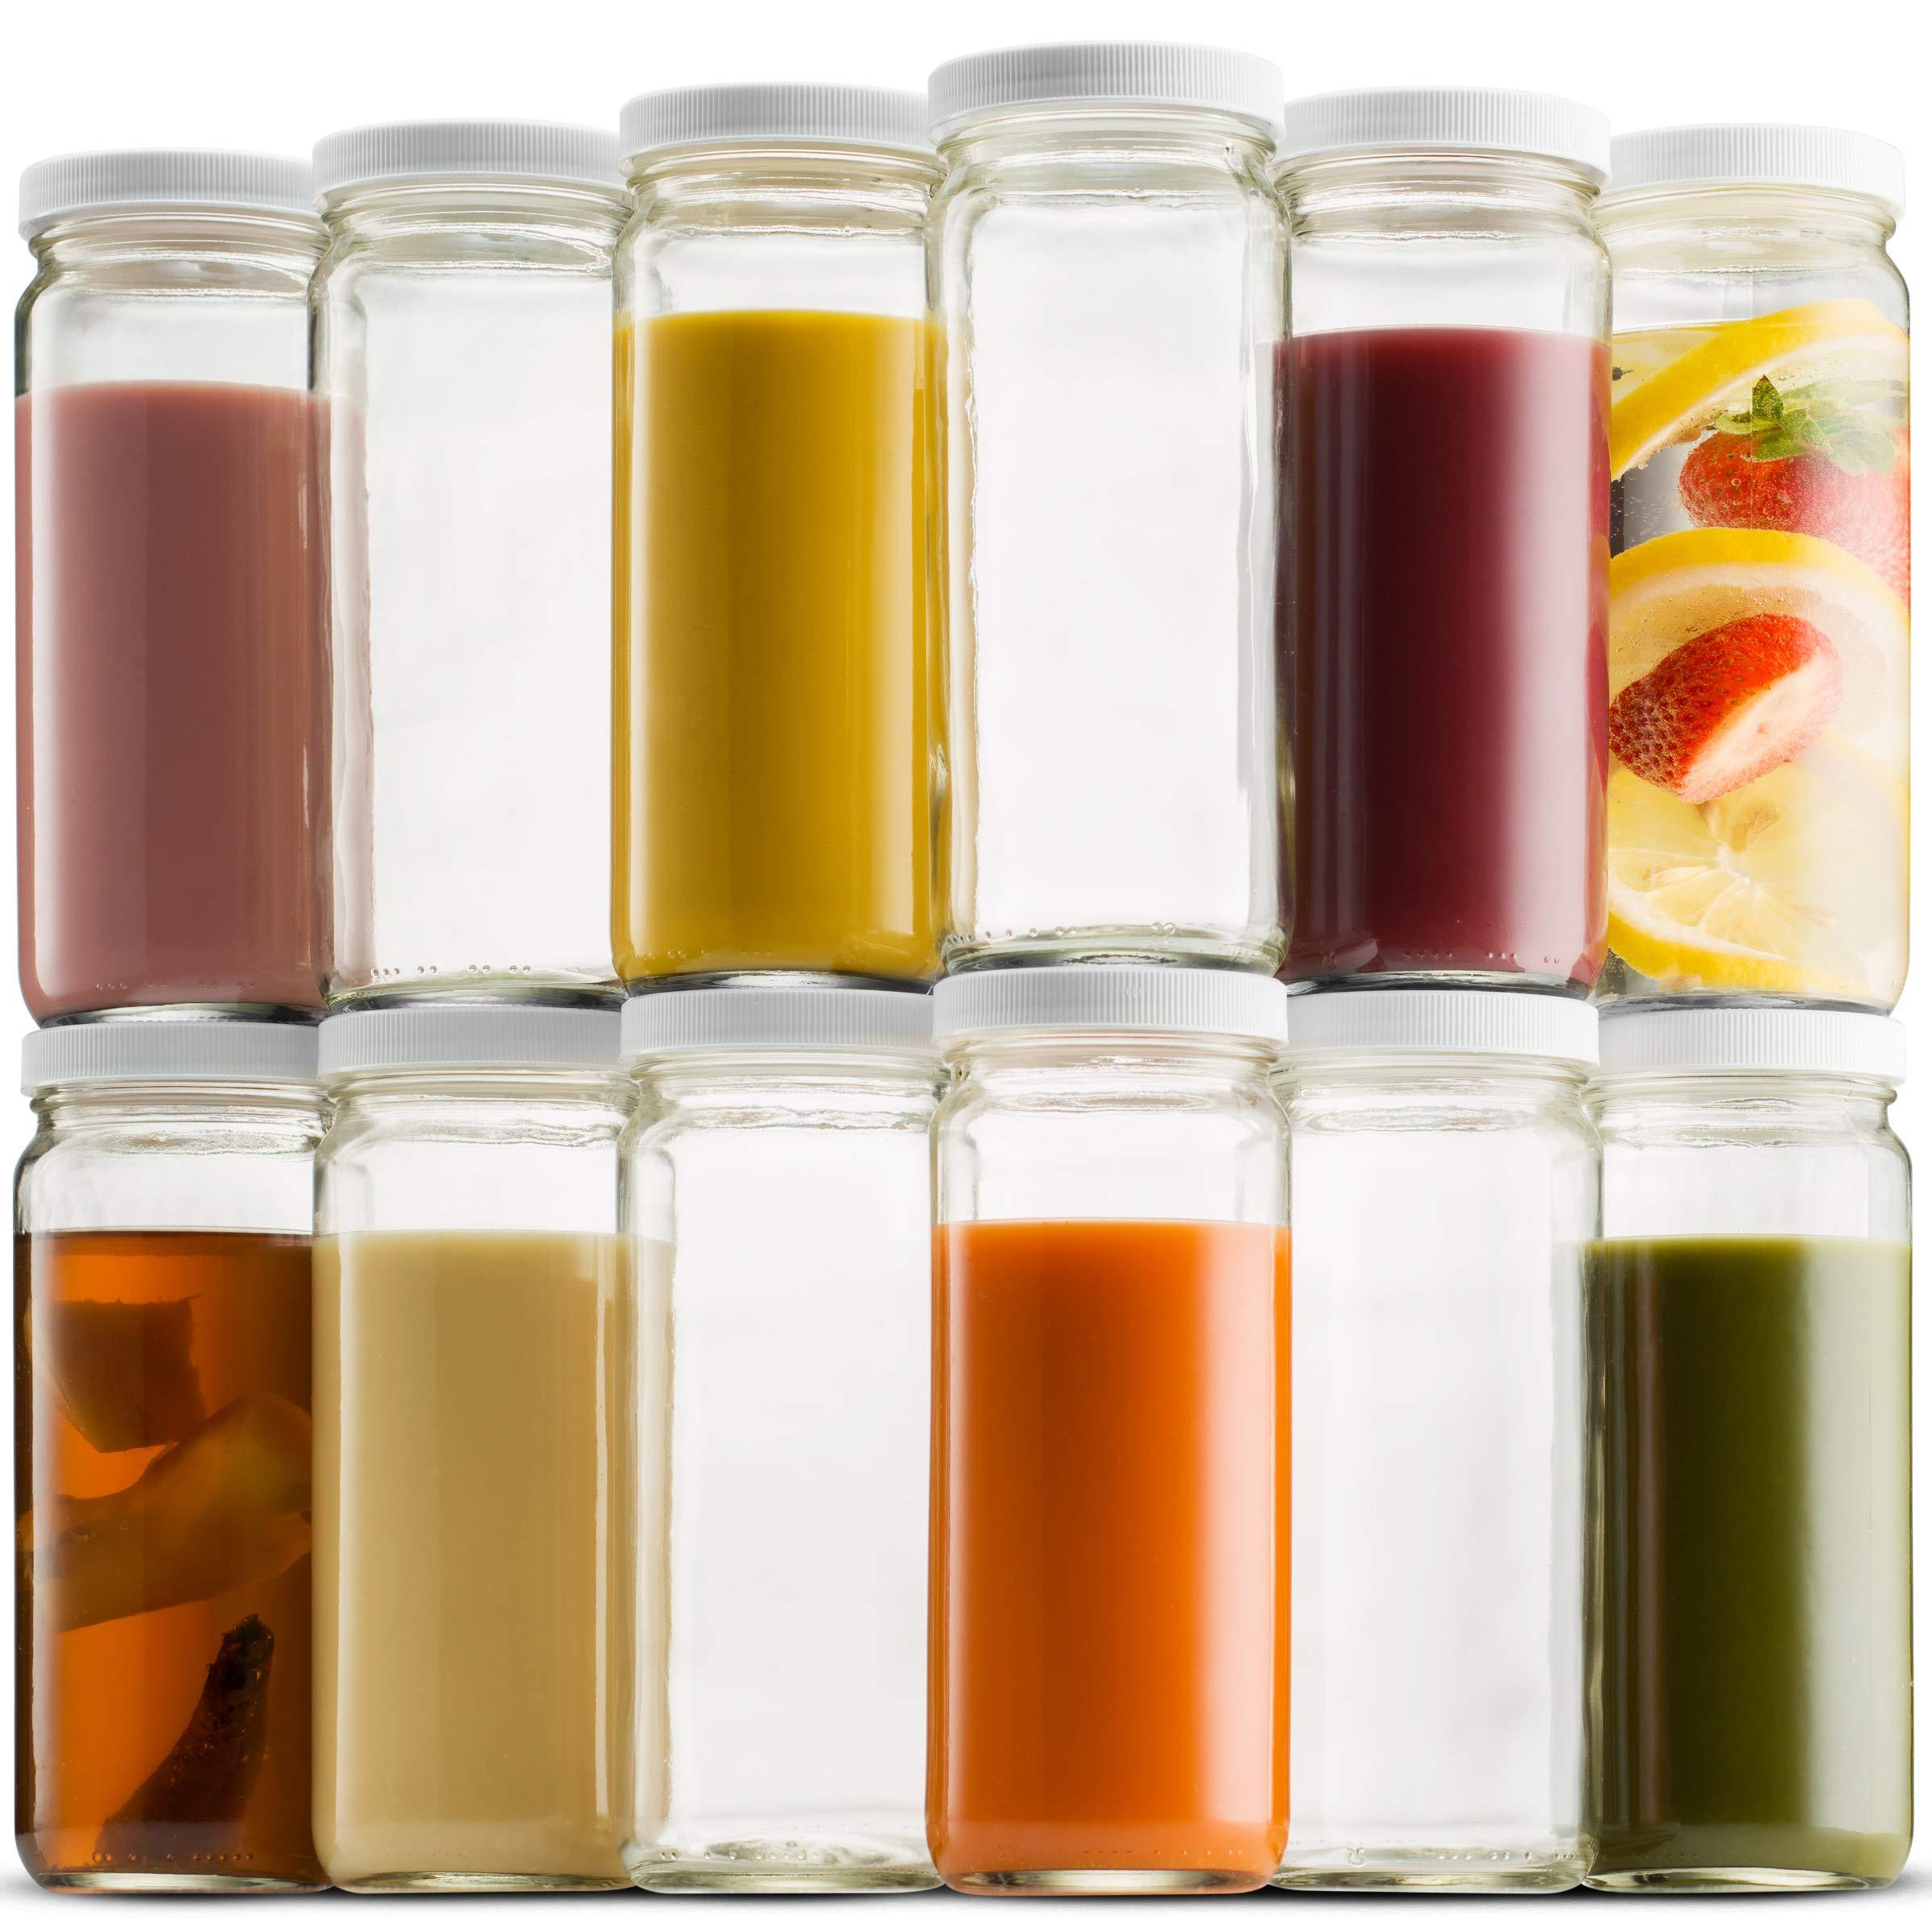 Travel Glass Drinking Bottle Mason Jar 16 Ounce [12-Pack] BPA-Free Plastic Airtight Lids, Reusable Glass Water Bottle for Juicing, Smoothies, Kombucha, Tea, Milk Bottles, Homemade Beverages Bottle,